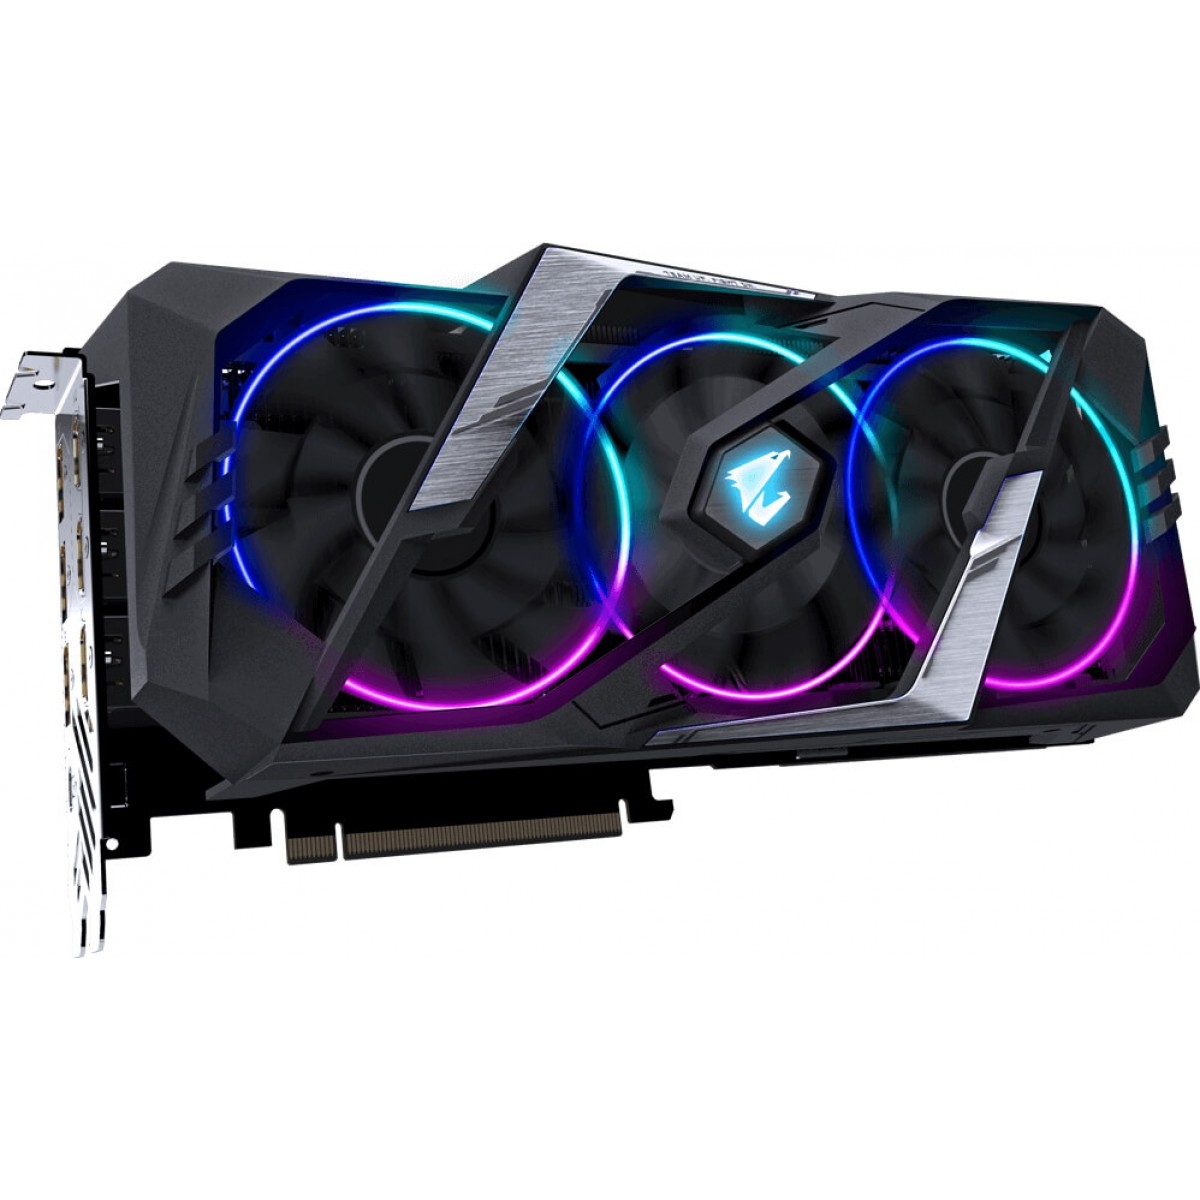 Placa de Vídeo Gigabyte Aorus GeForce RTX 2080 Super, 8GB GDDR6, 256Bit